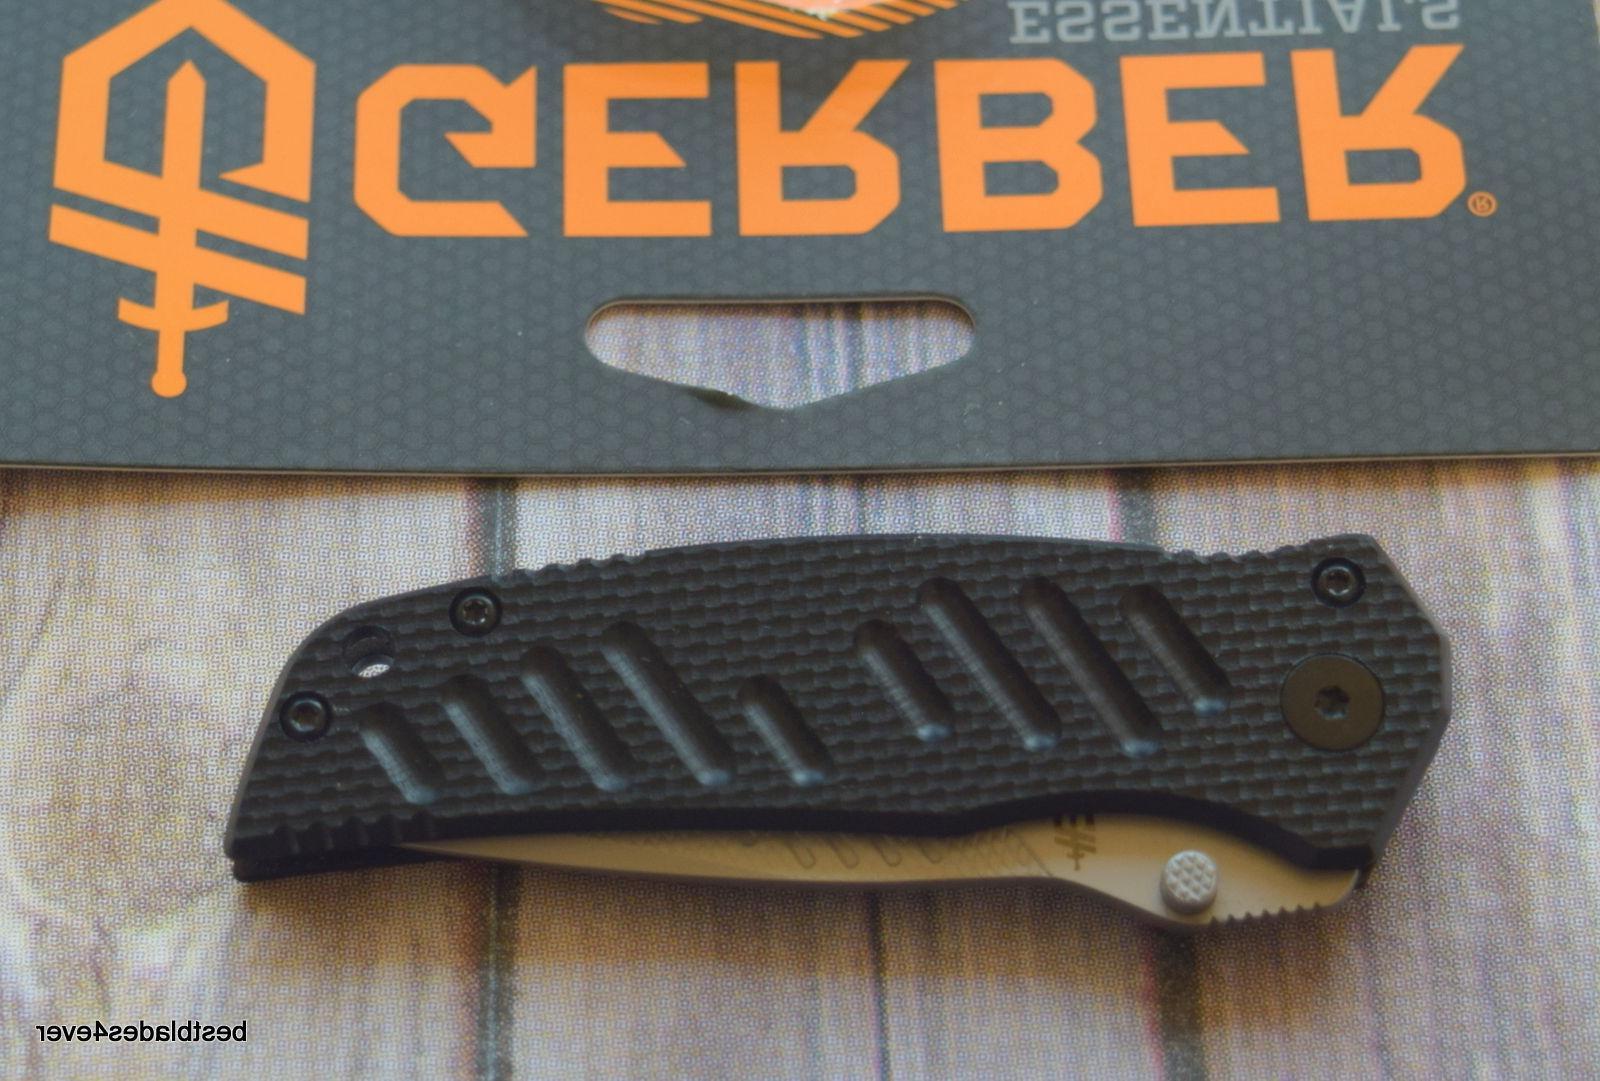 6.2 INCH OVERALL GERBER G-10 SWAGGER FRAME-LOCK FOLDING KNIFE POCKET